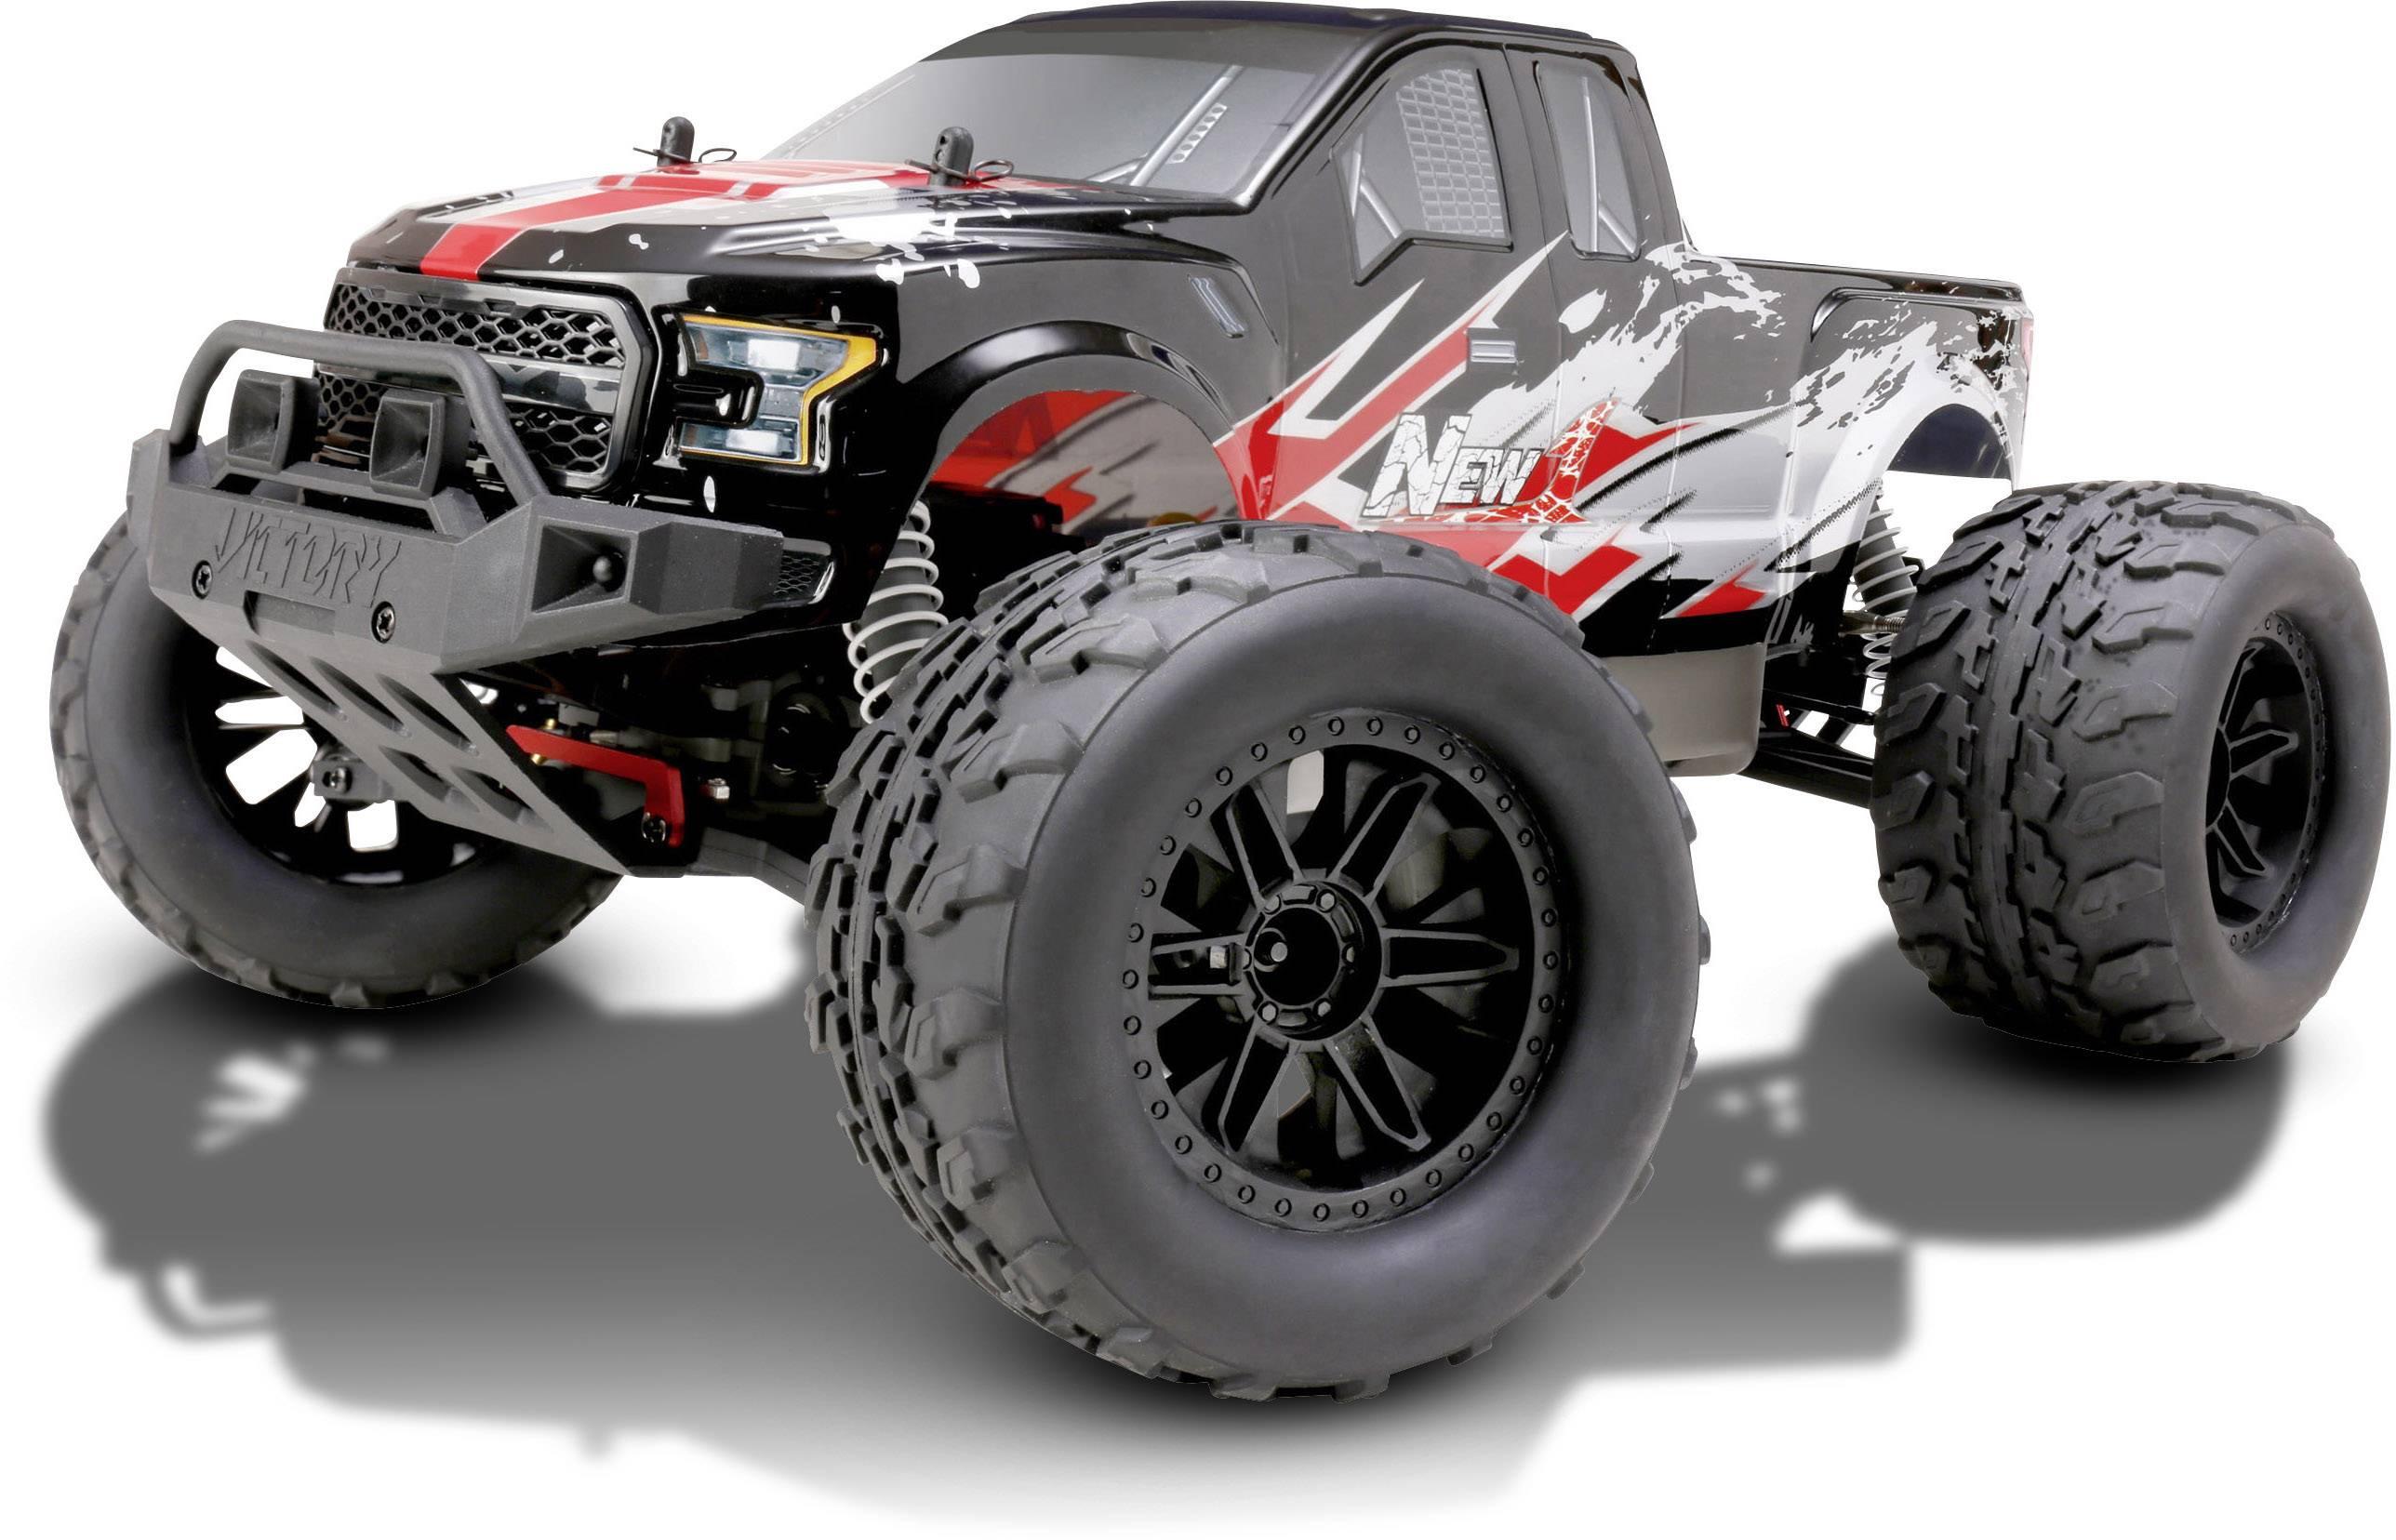 Karoséria Reely 1600334 vhodné pre RC model auta monster truck Reely NEW1, 1:10